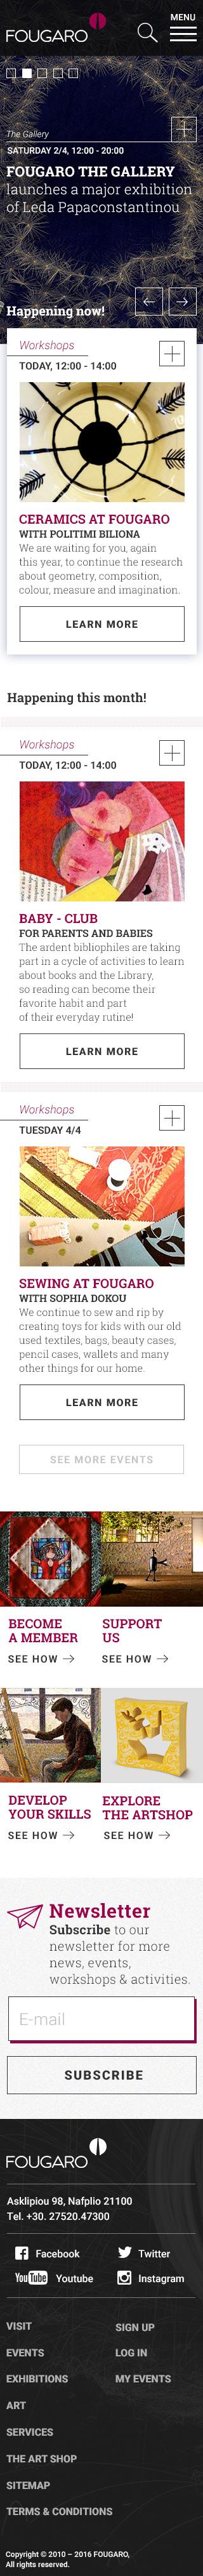 fougaro-mobile-homepage